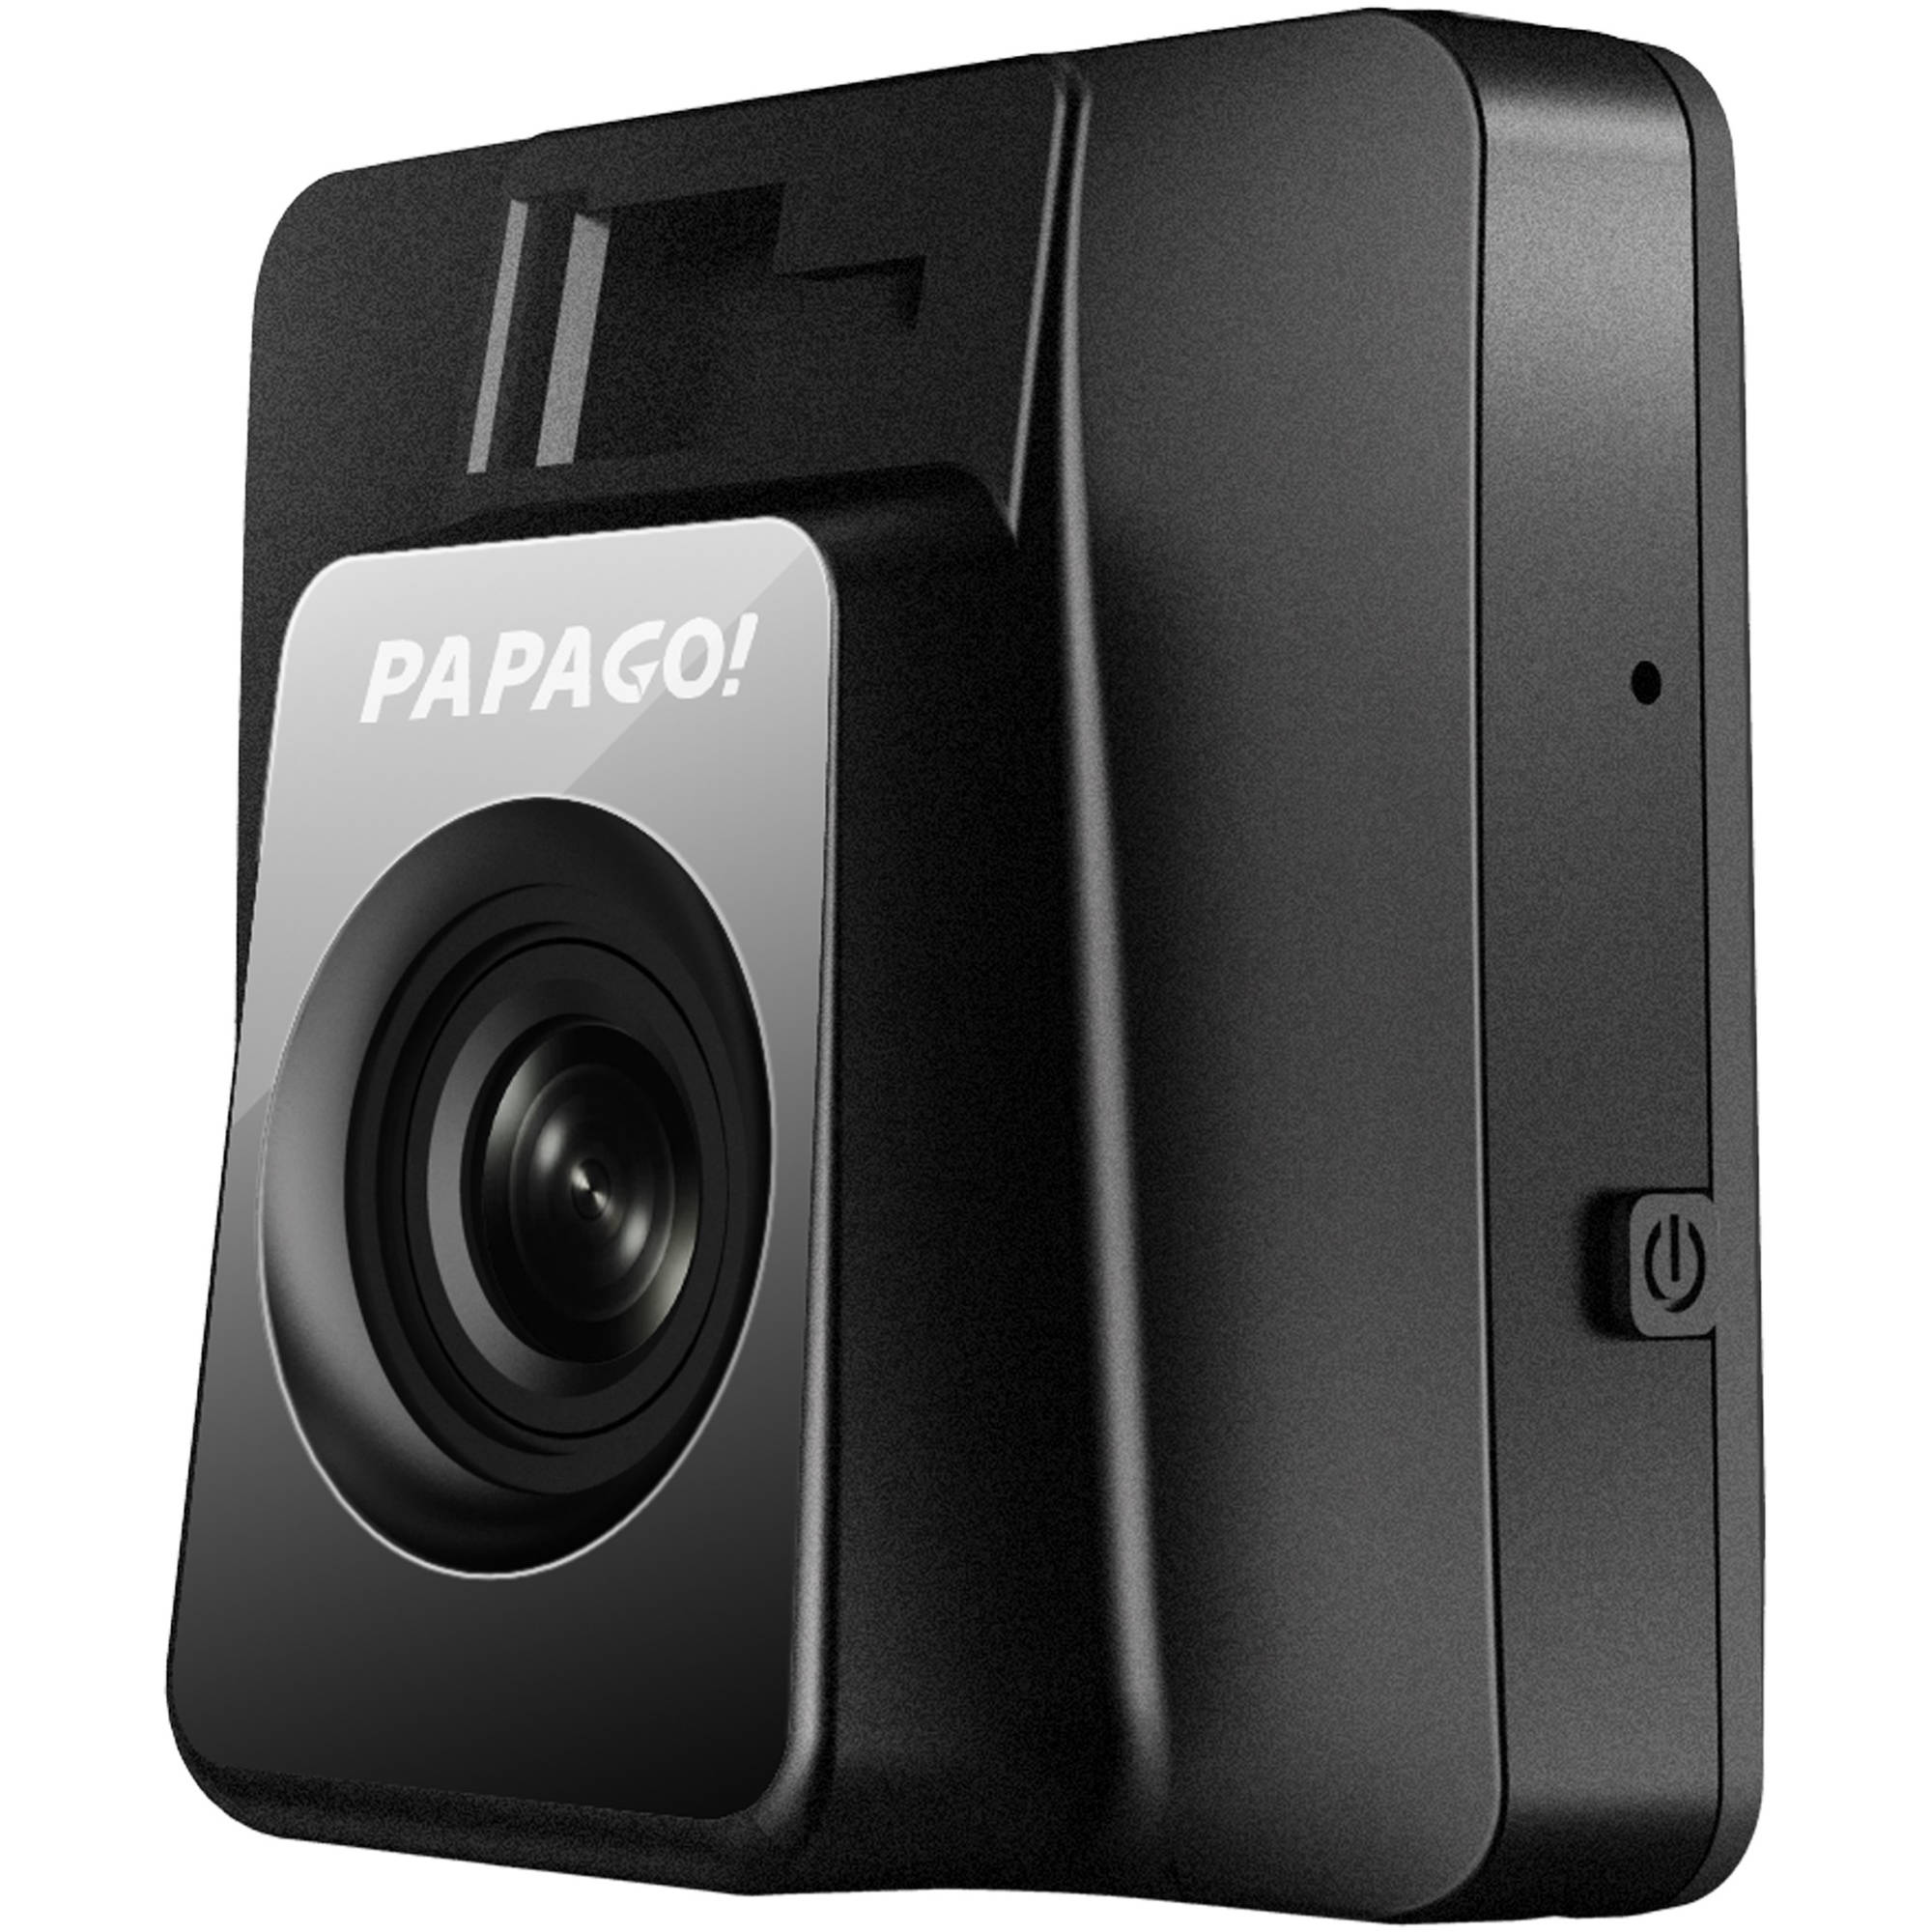 "PAPAGO GoSafe 118 HD Dash Cam Car DVR Dashboard Camera Video Recorder with Adhesive Mount, Night Vision, Parking Monitor, G-Sensor ,2"" Screen (GS118-US)"